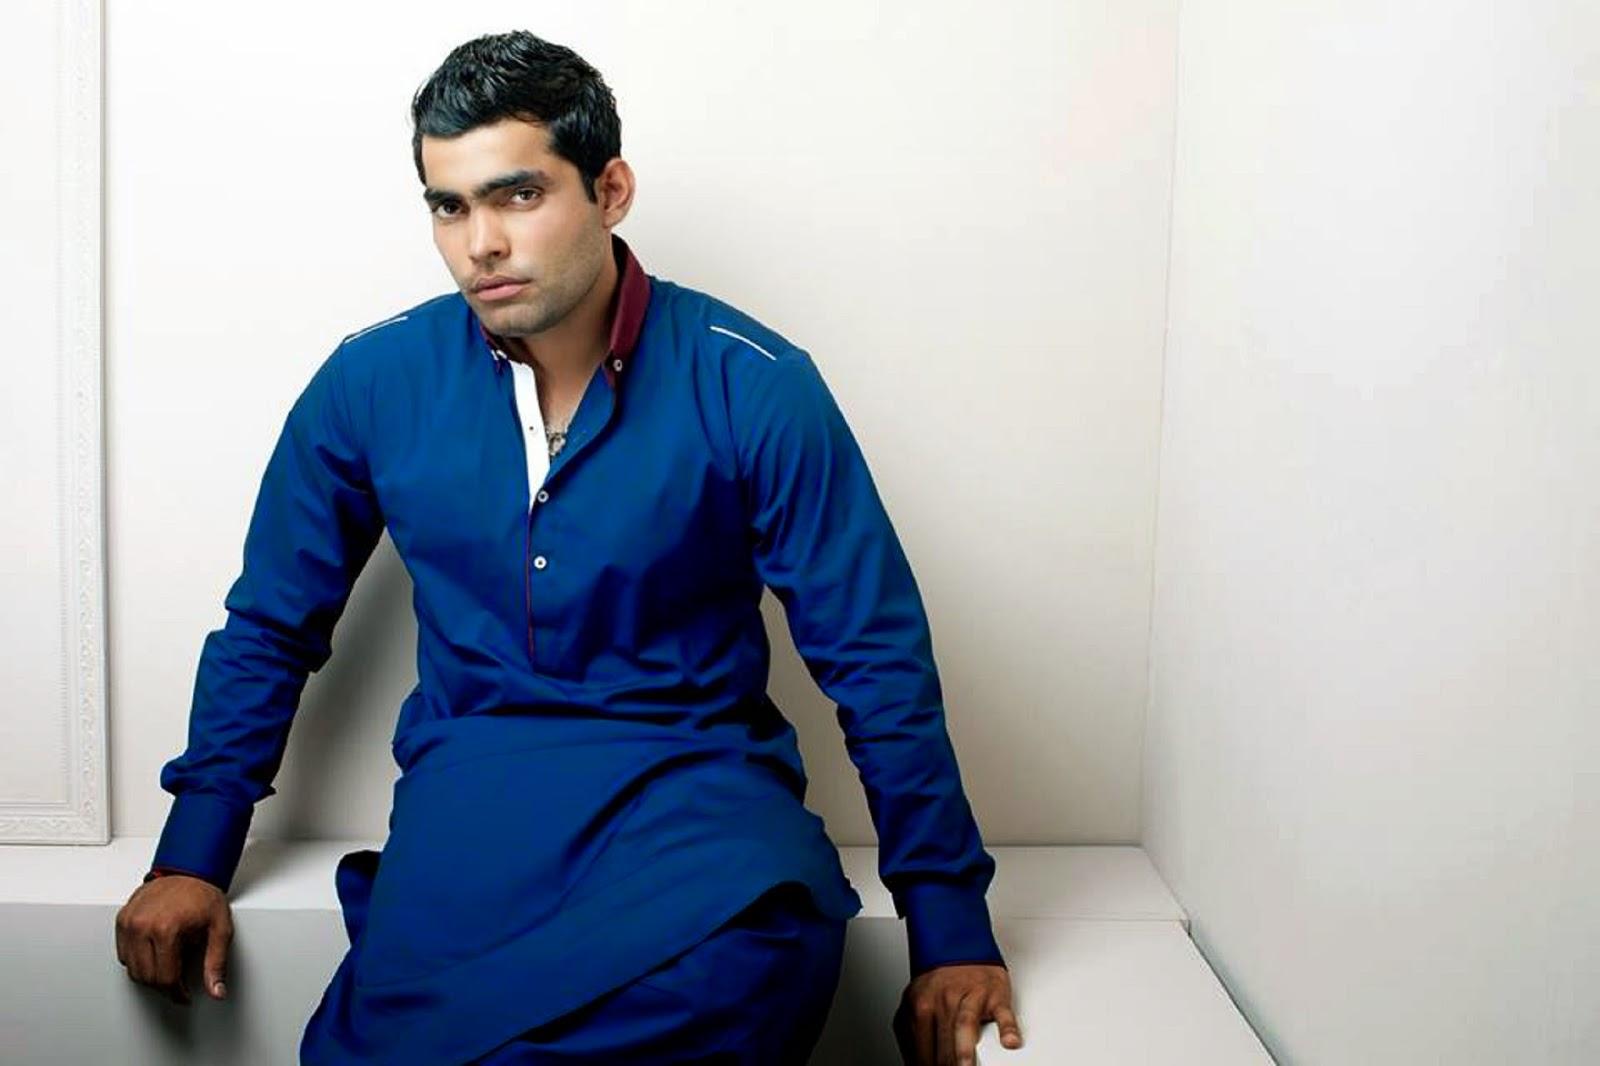 Pakistani Cricketer Umar Akmal Images Hd Wallpaper All